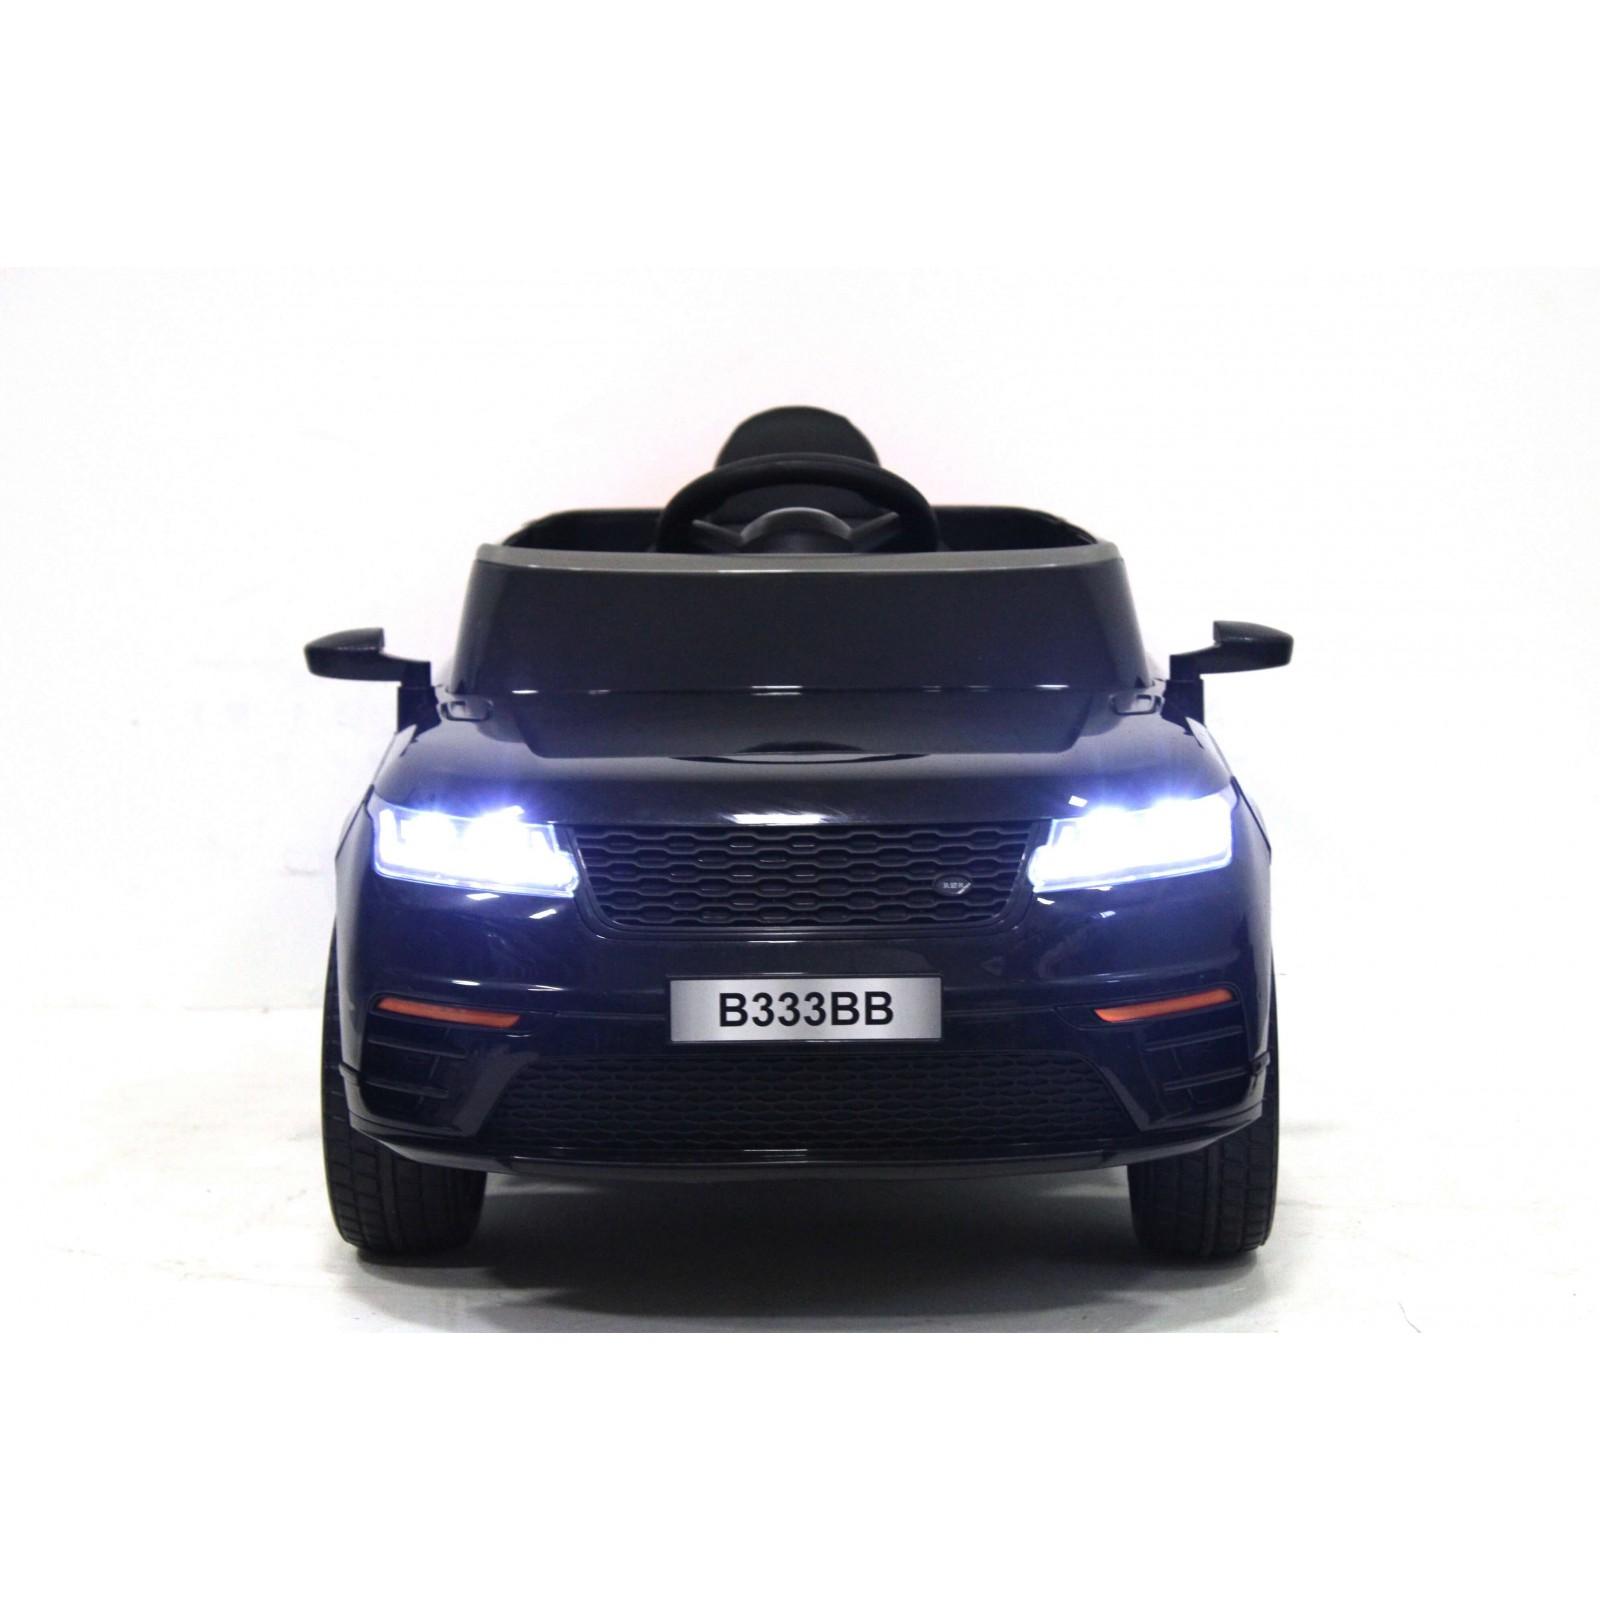 Детский электромобиль Range-Rover SPORT (B333BB)